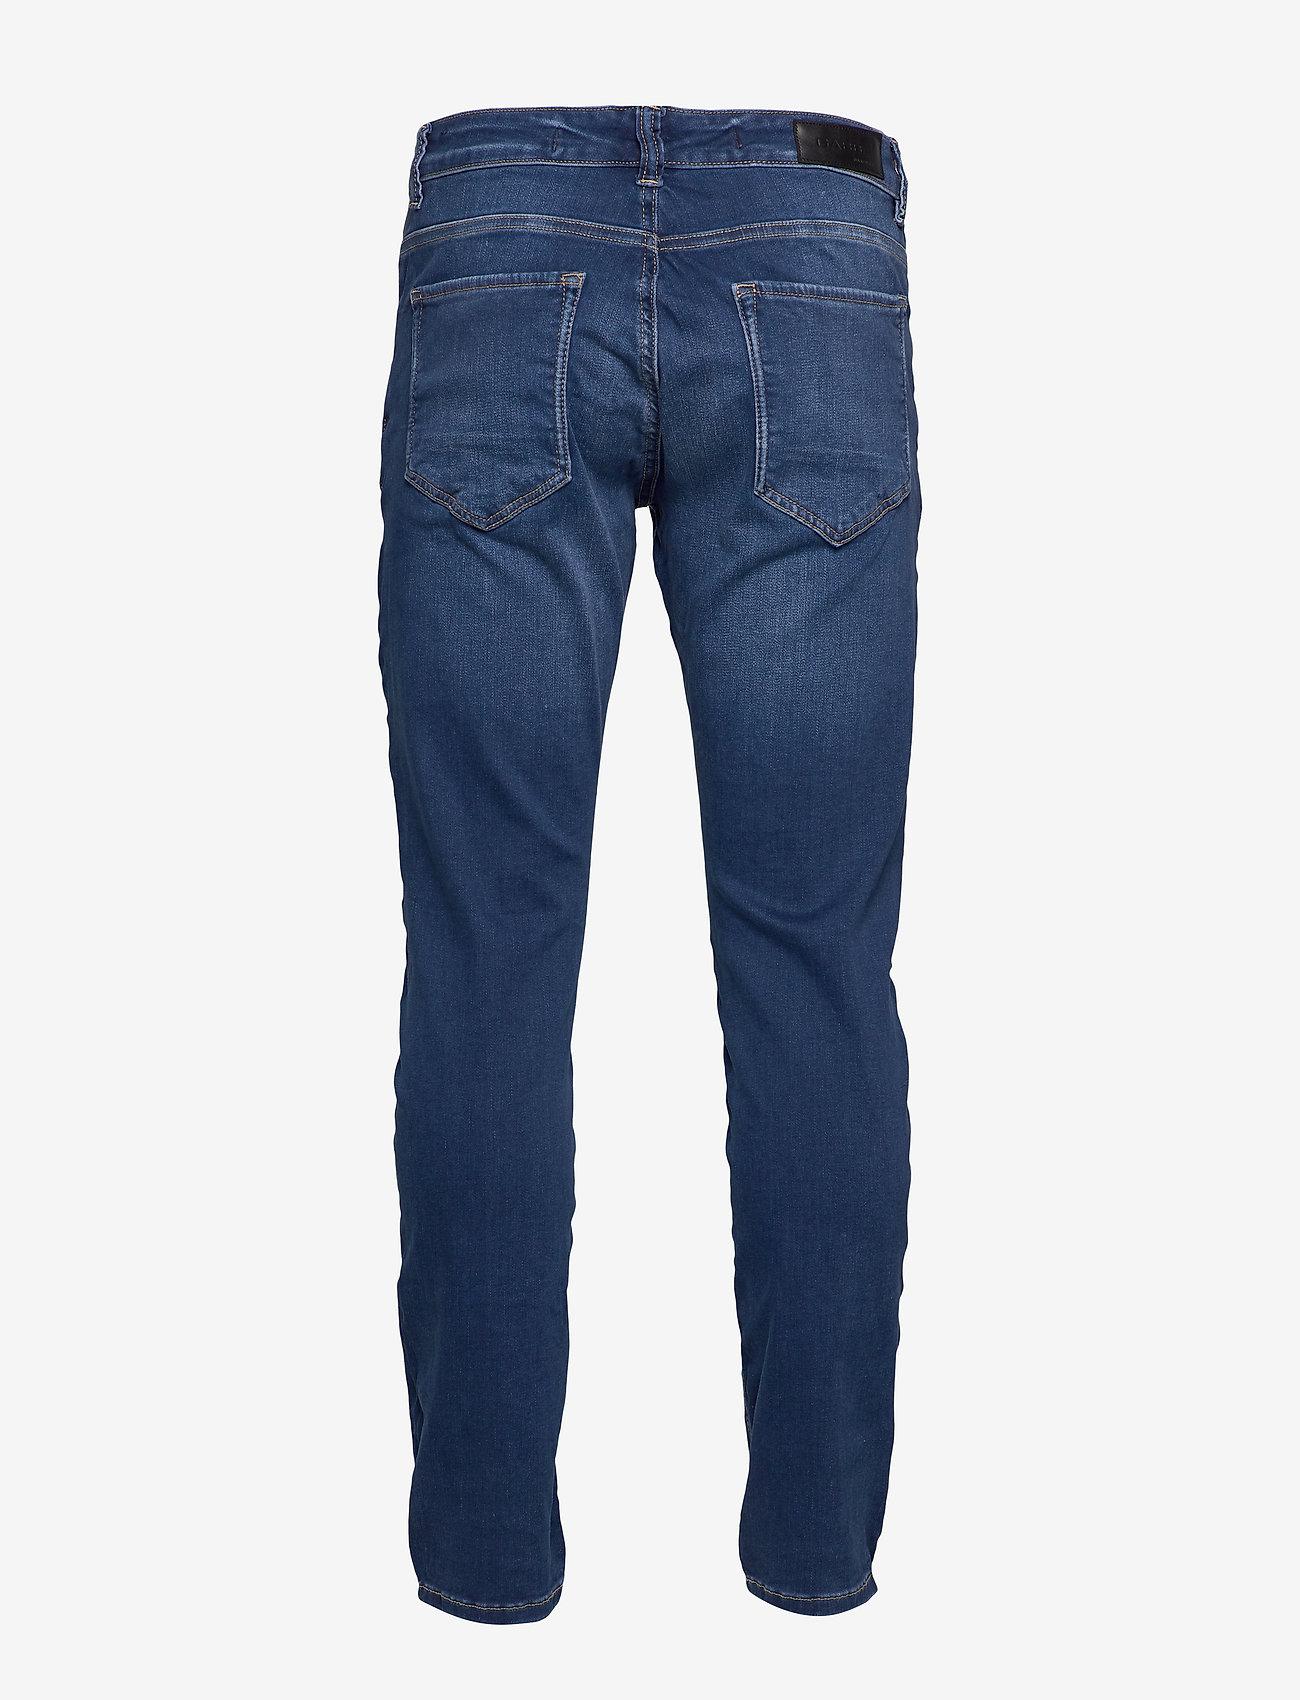 Gabba - Jones K2213 Bright - slim jeans - rs1099 - 1